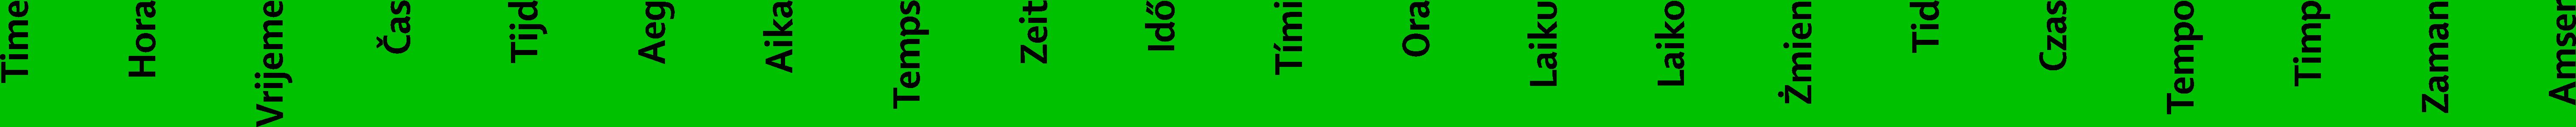 Image-twelve